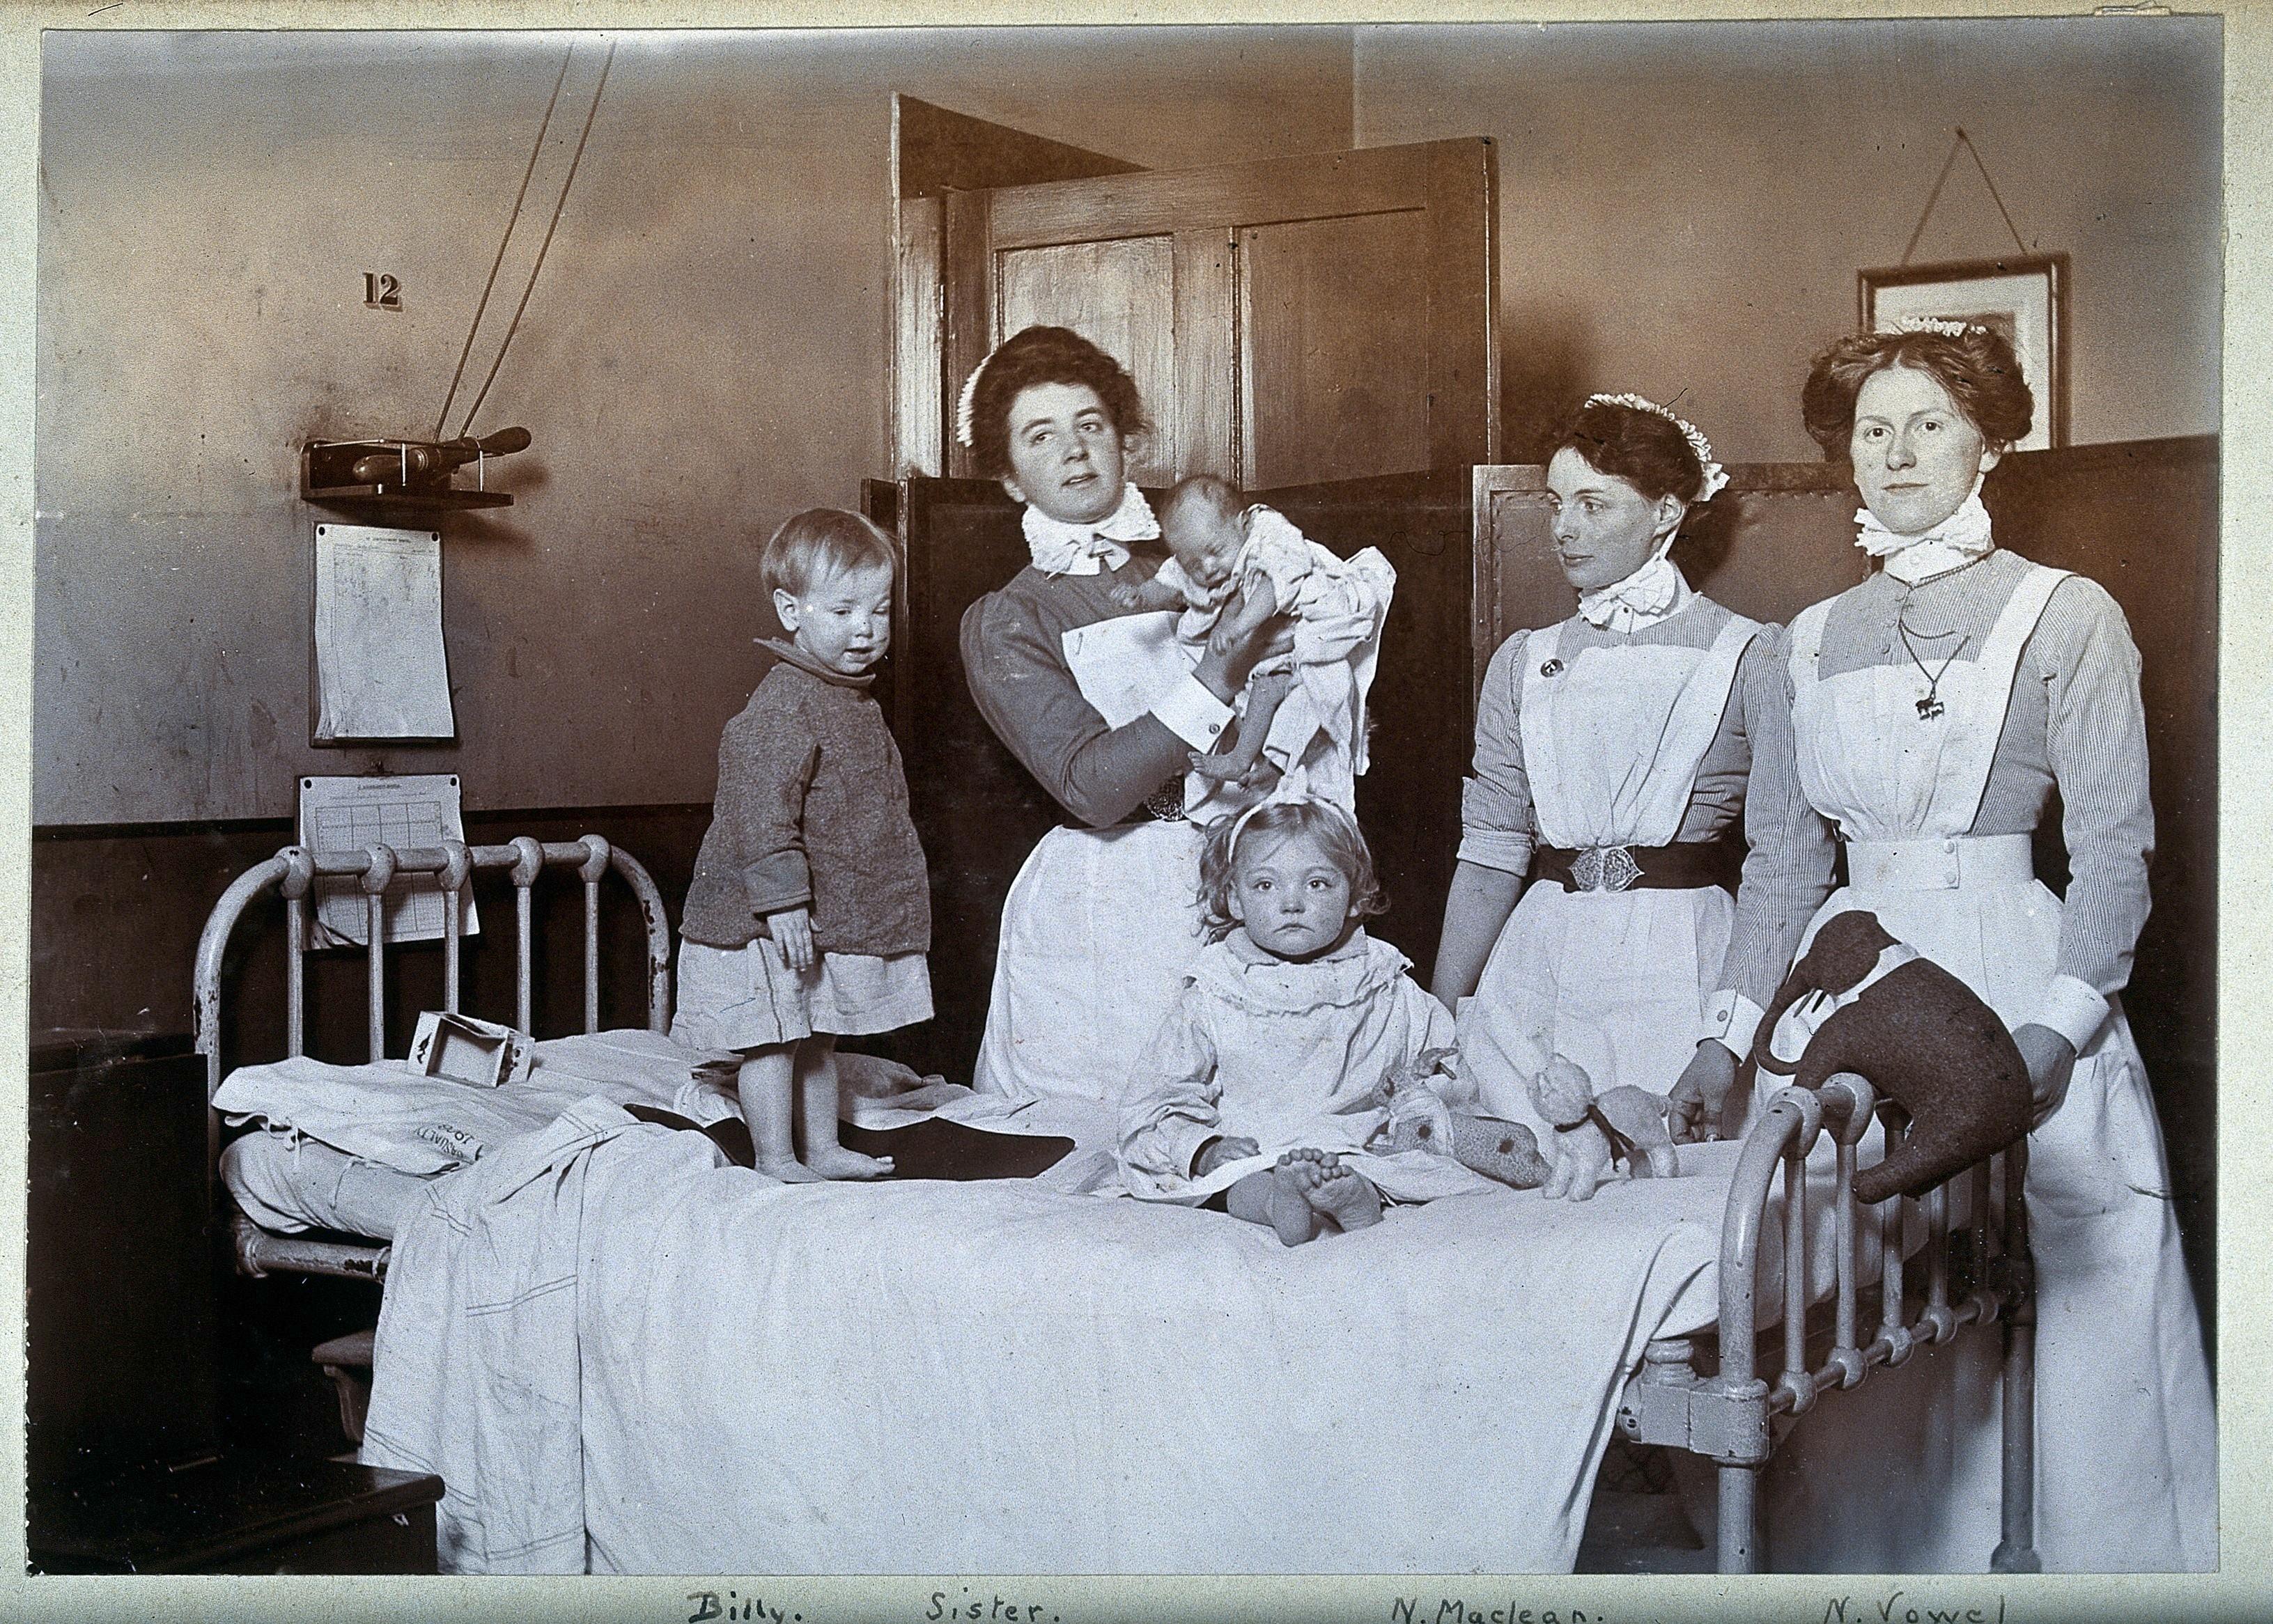 St Bartholomew's Hospital London c1890, courtesy of the Wellcome Collection